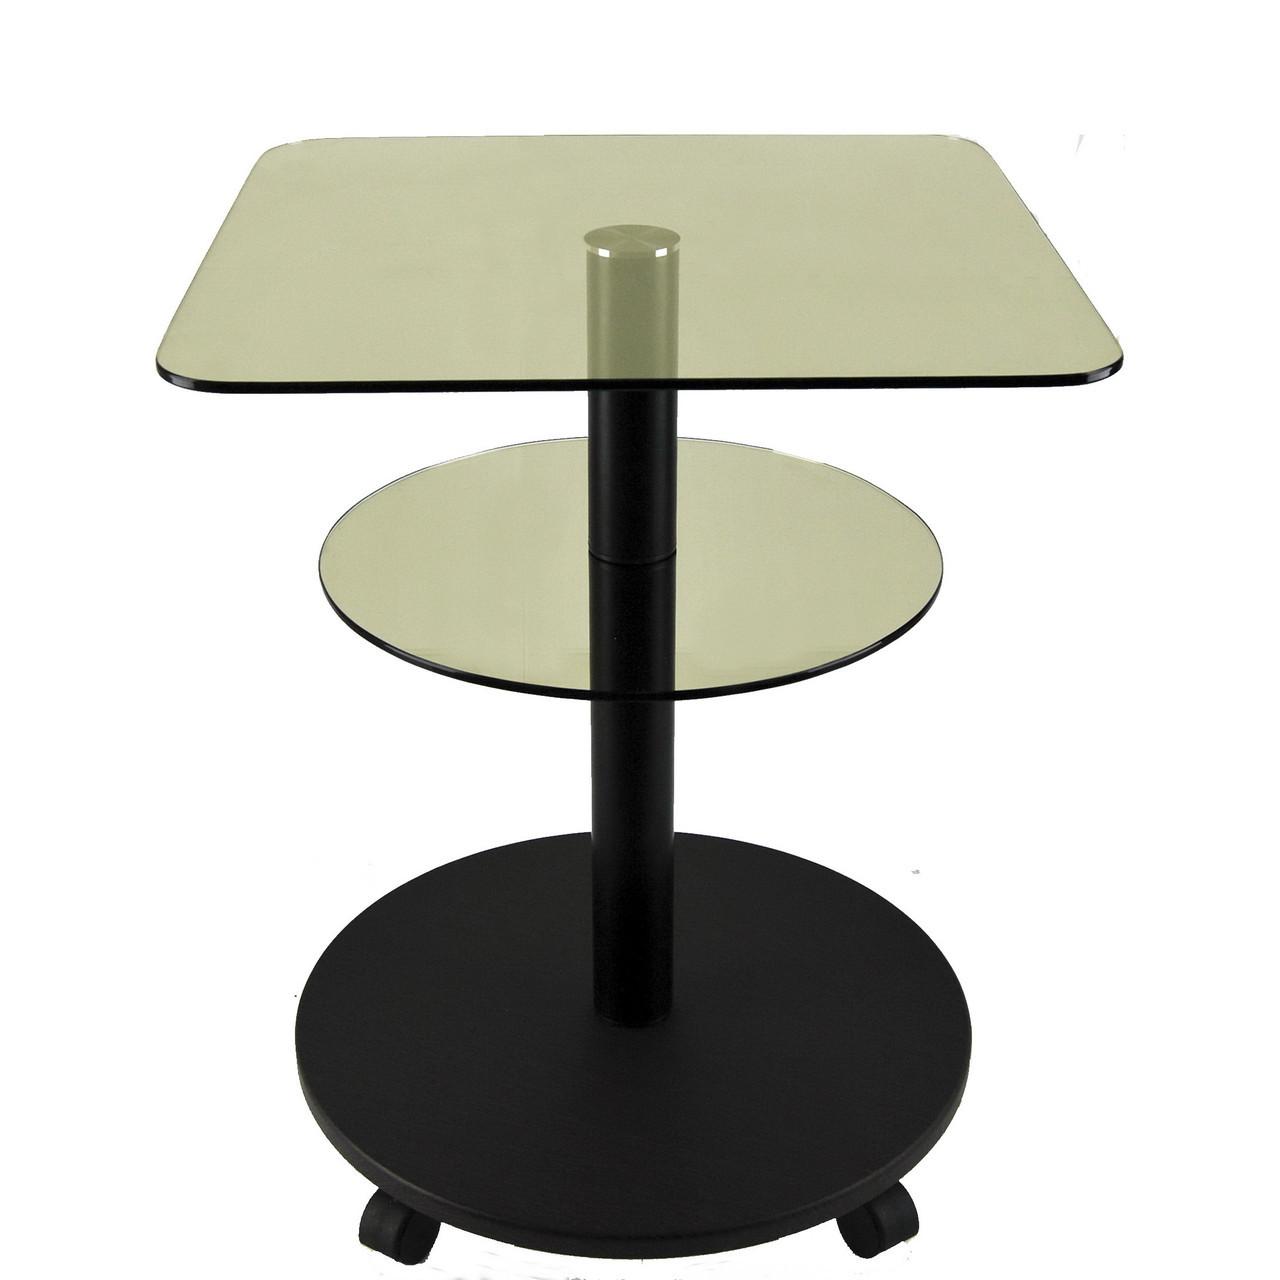 Стол журнальный стеклянный квадратный Commus Bravo Light450 Kv6 gold-venge-bl50